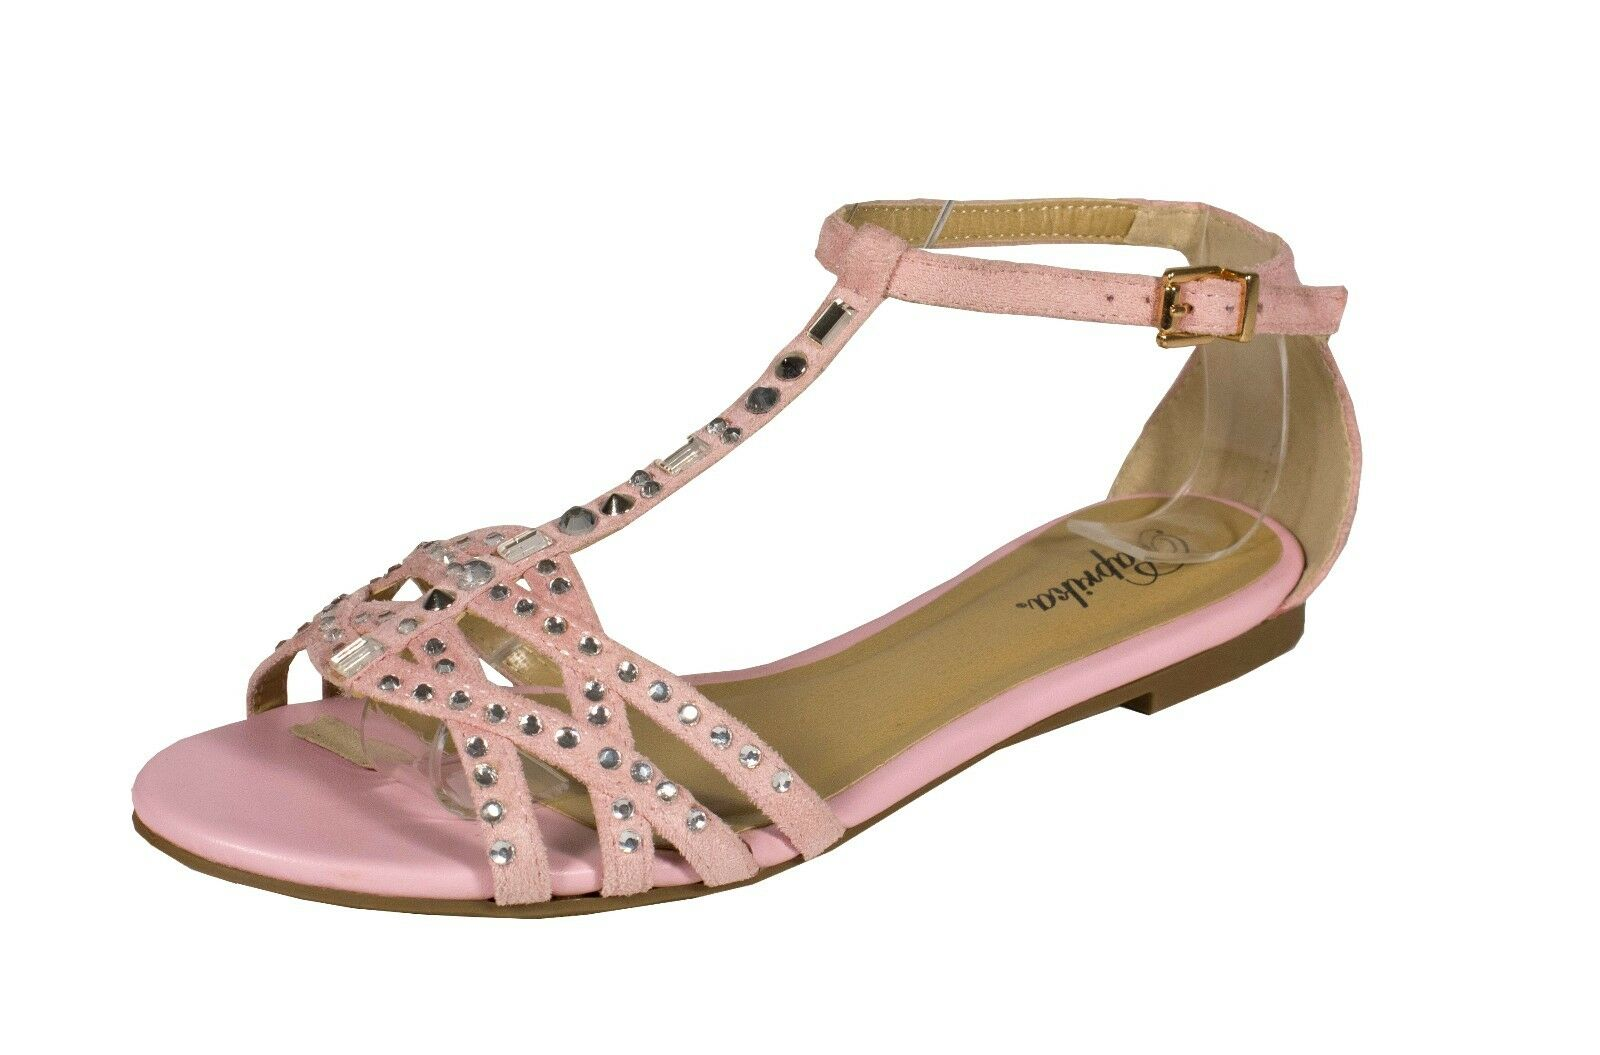 Timber! Paprika Strappy Pink Studding T-Strap Peep Toe Flat Sandal Pink Strappy Faux Suede b74e93